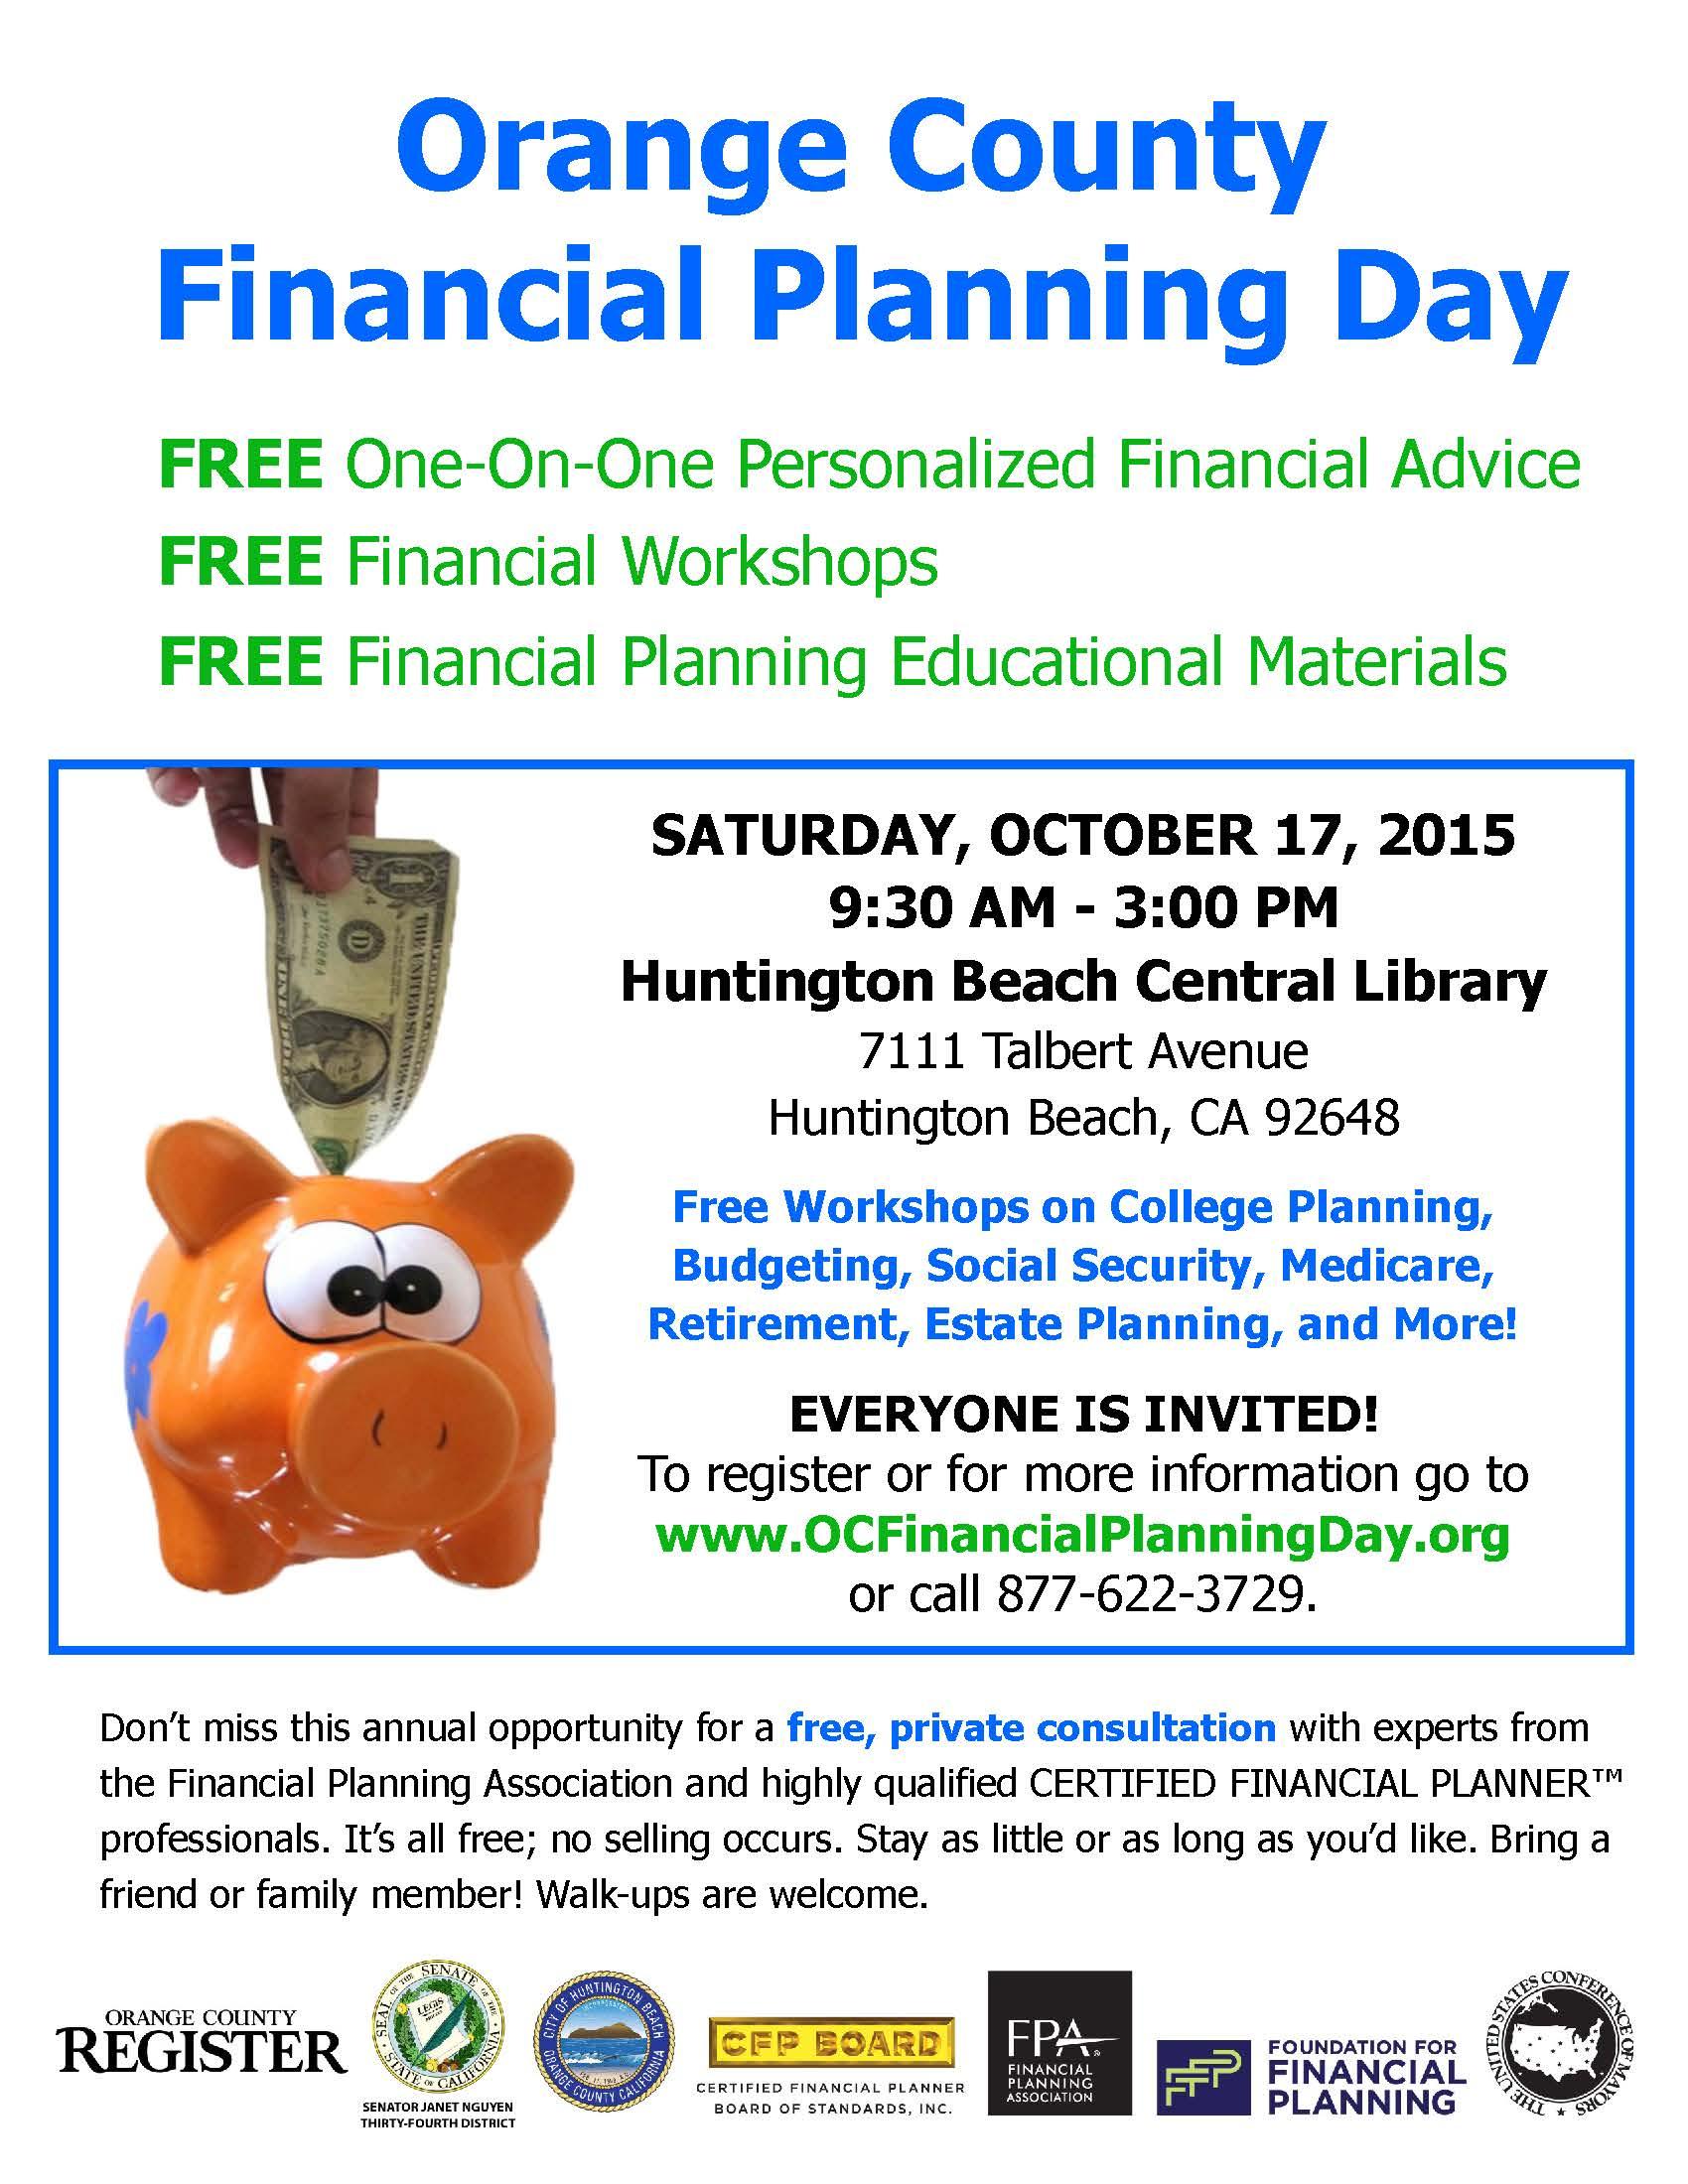 City of Huntington Beach s Free Financial Planning Day on October 17 2015 Orange Coast